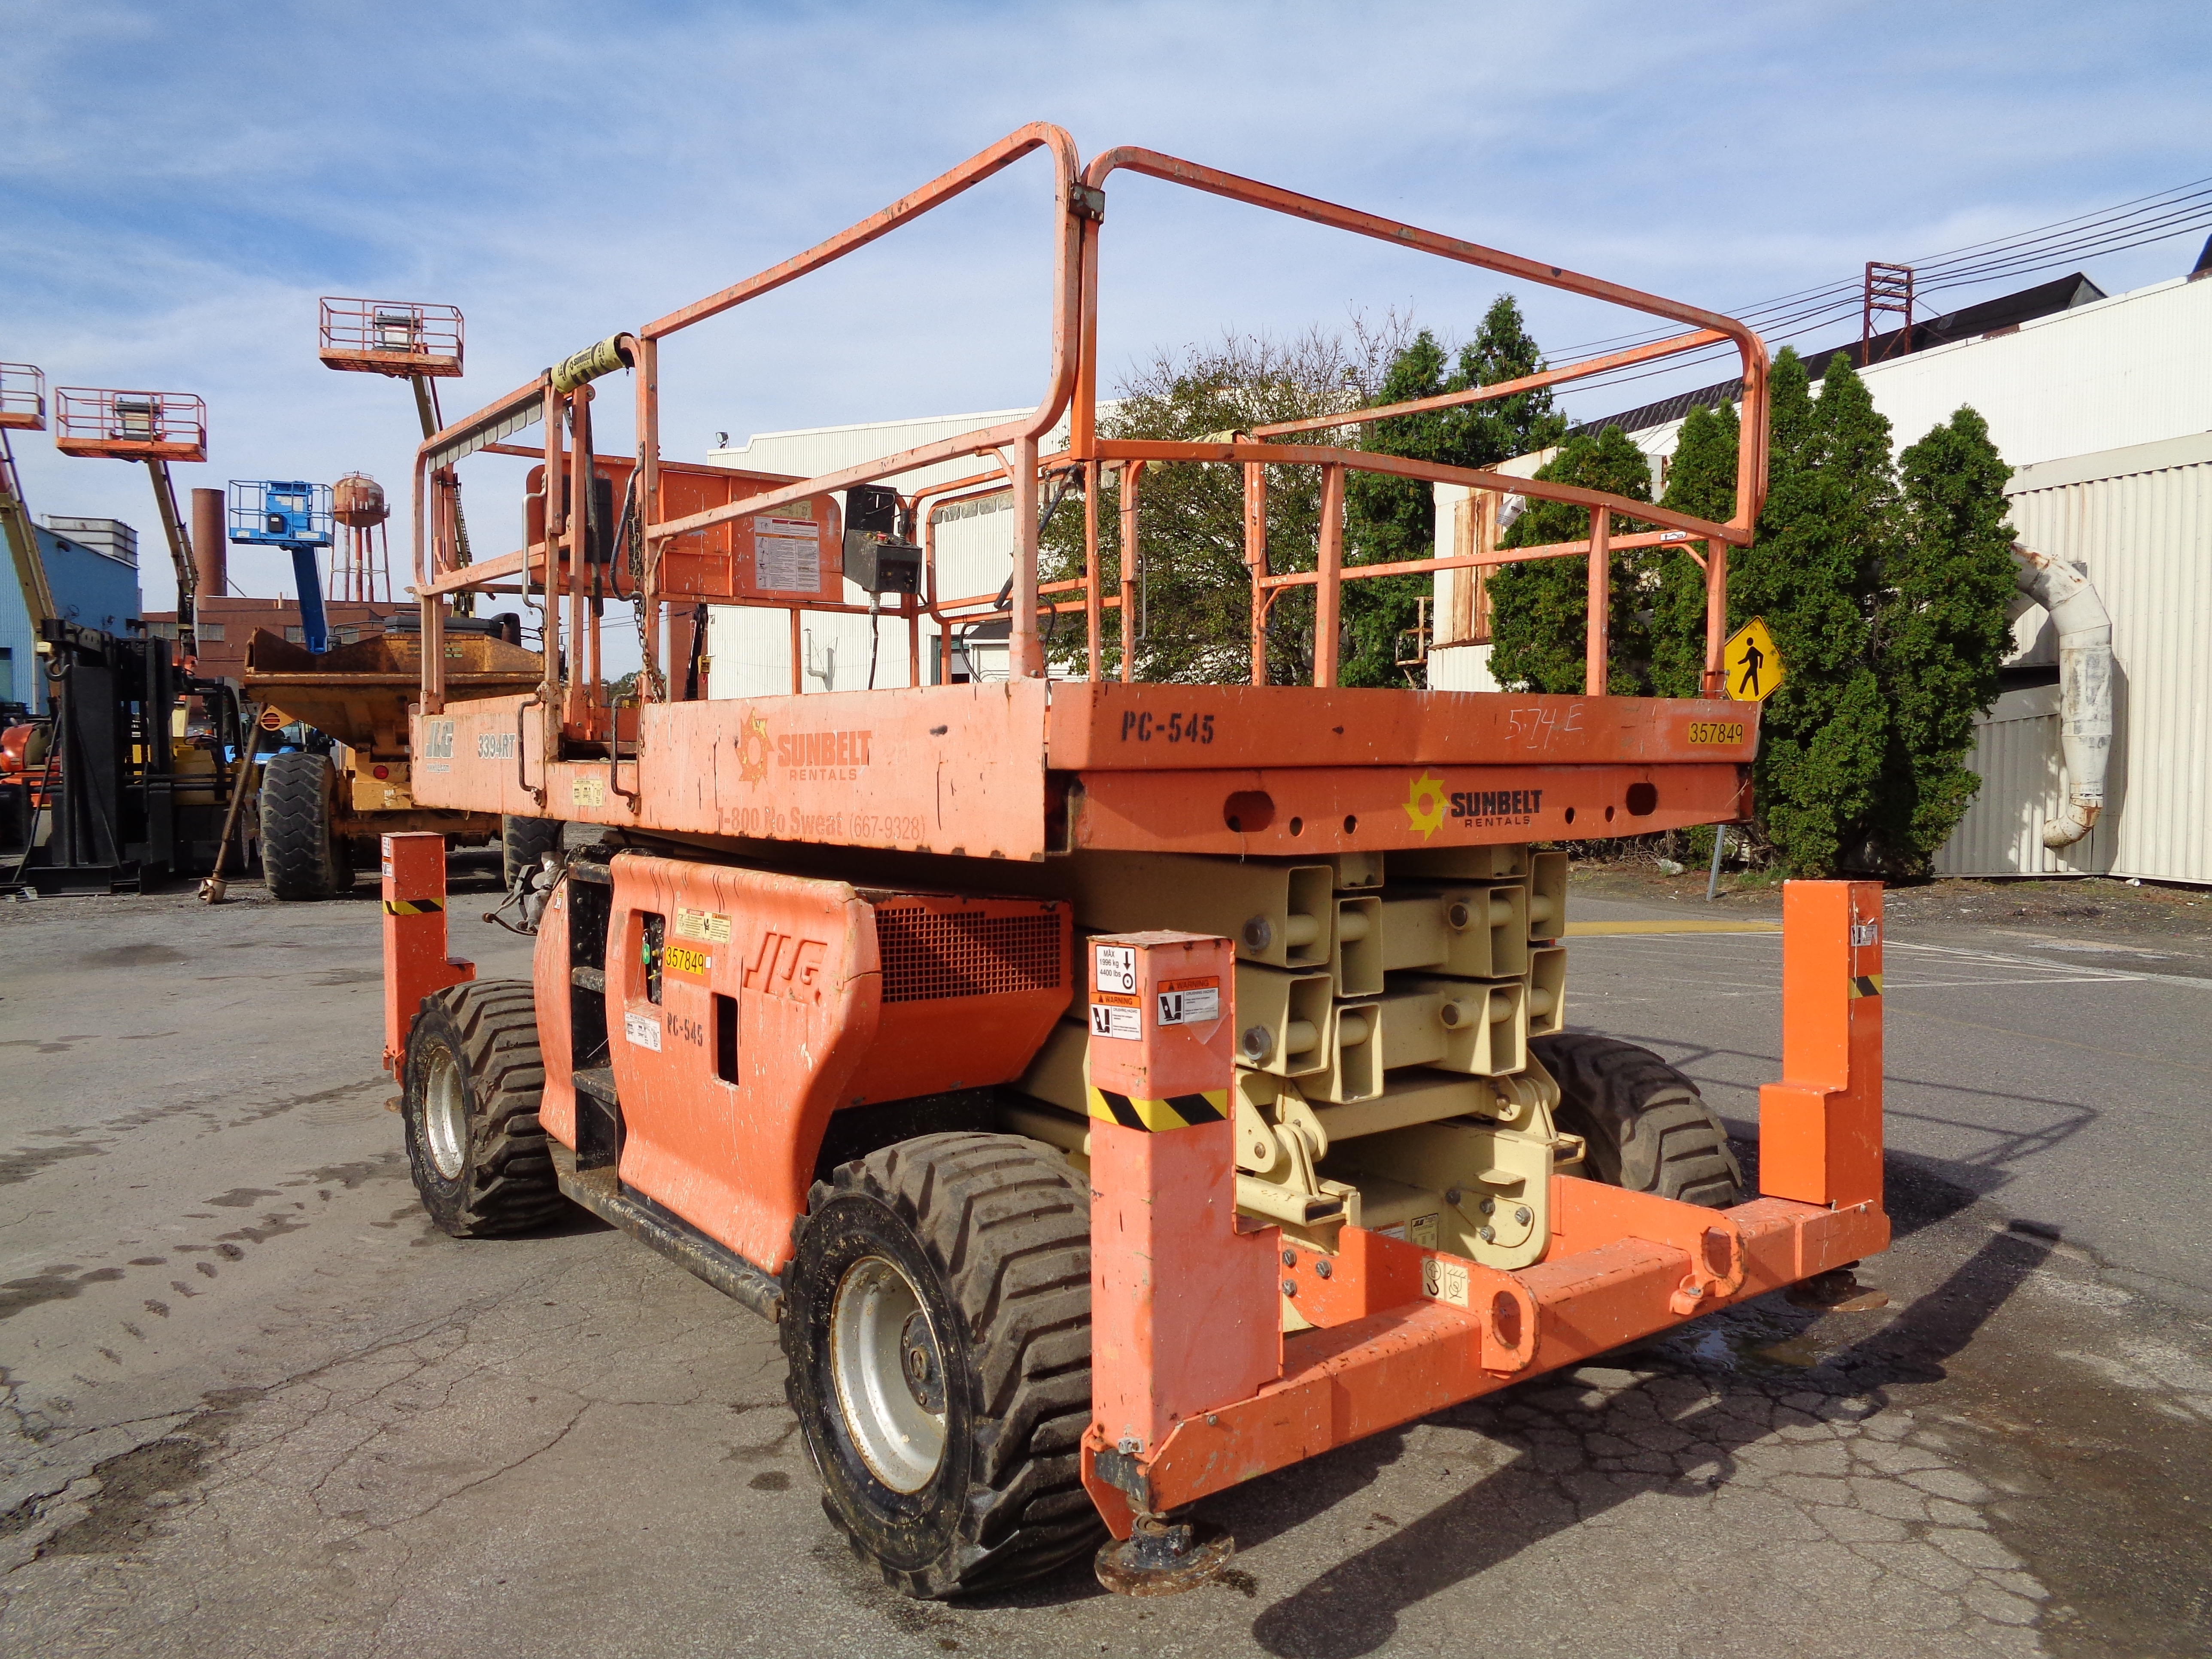 Lot 49 - 2009 JLG 3394RT 33ft Height Rough Terrain Scissor Lift - 4x4 - Dual Fuel